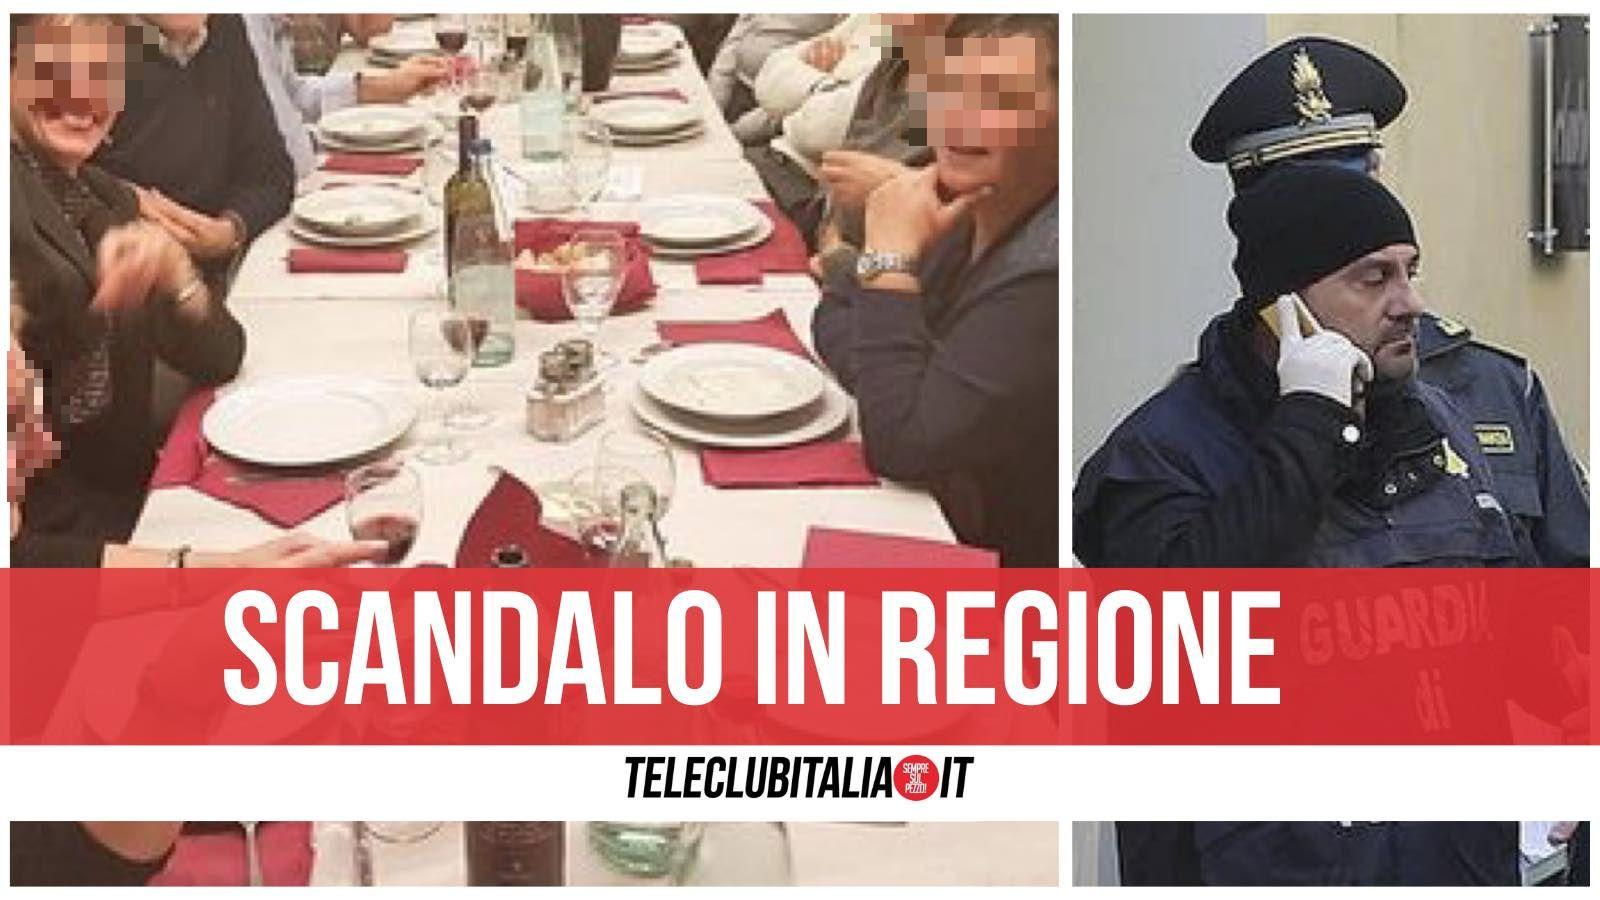 sardegna zona rossa ristorante politici pranzo